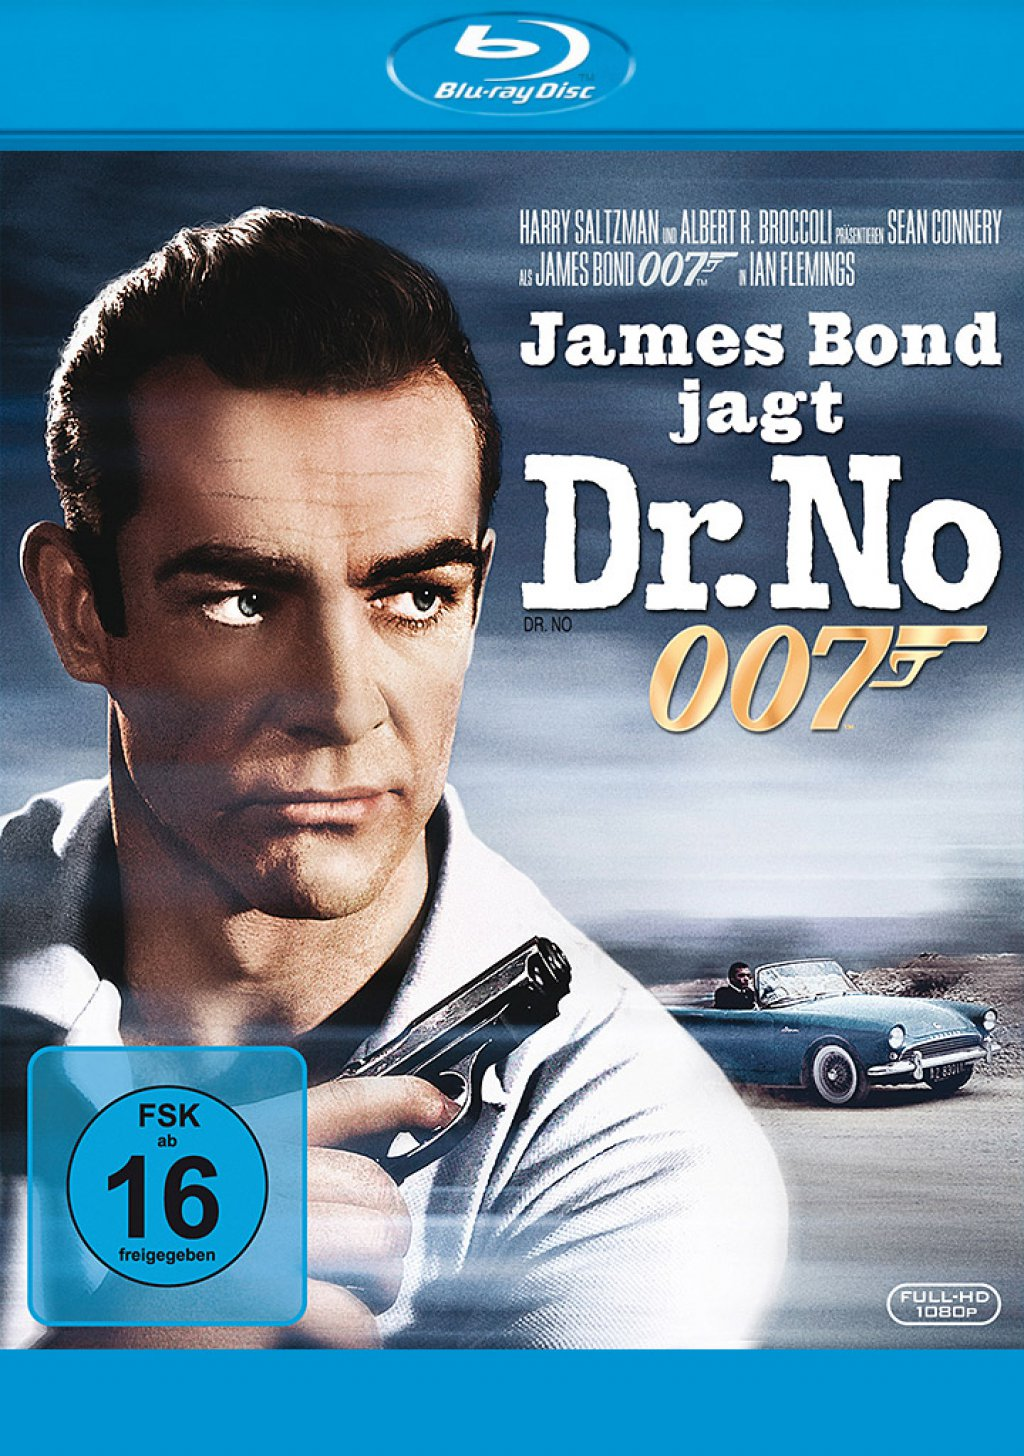 James Bond 007 - James Bond jagt Dr. No - 2. Auflage (Blu-ray)